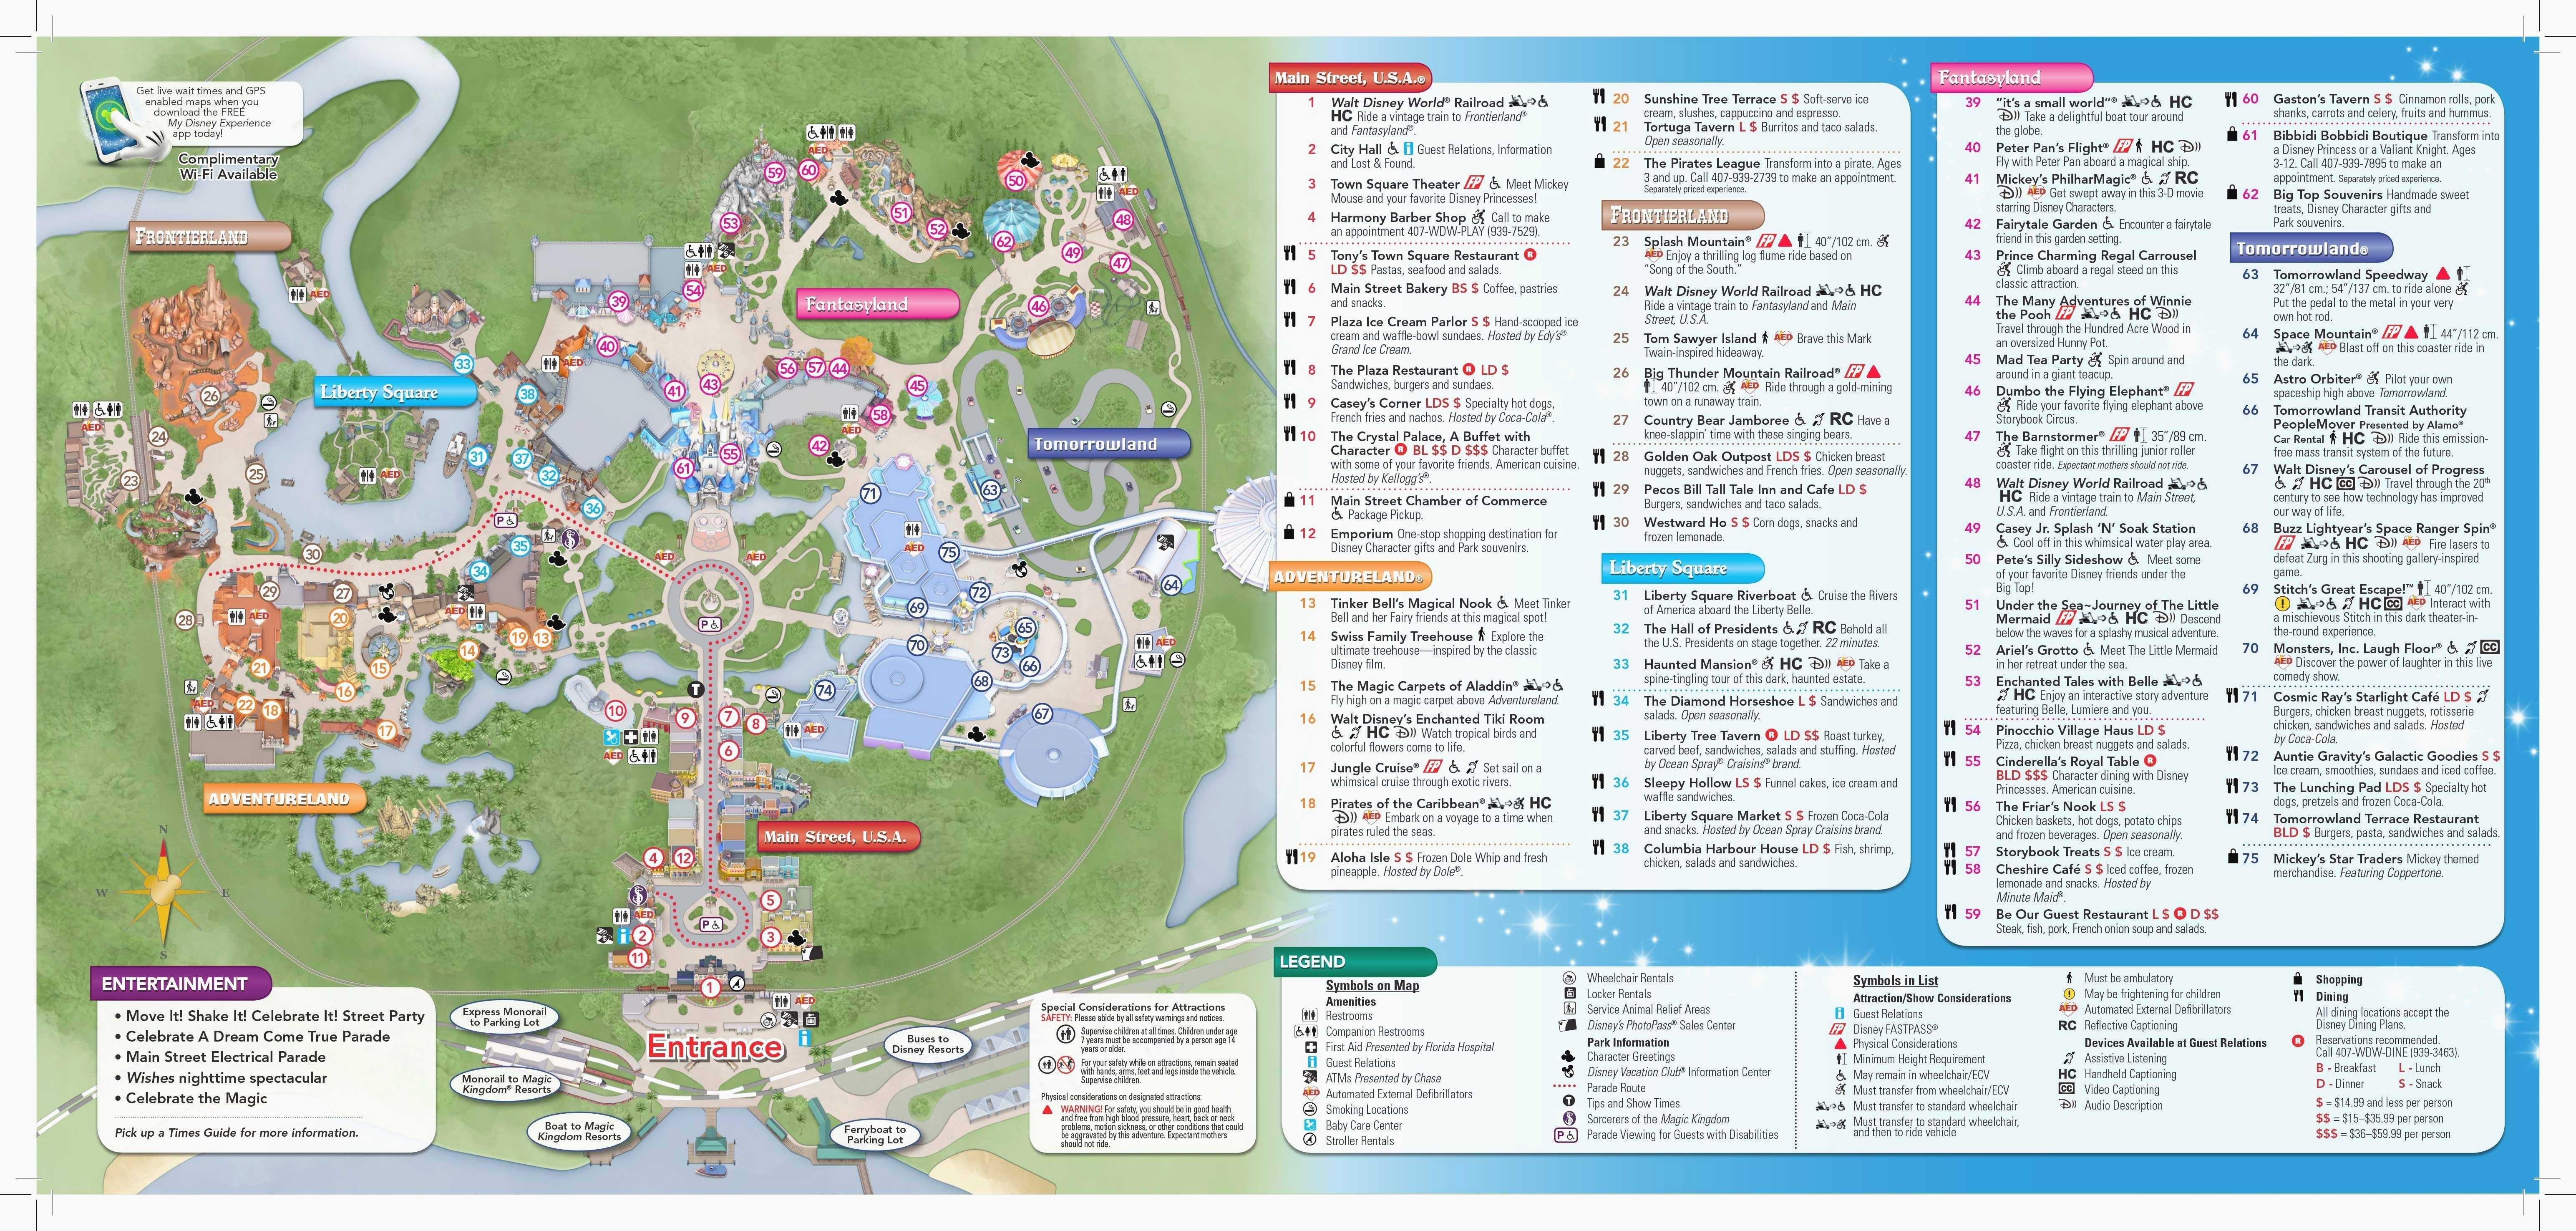 Printable Disney World Maps - Mobilacomanda - Printable Disney World Maps